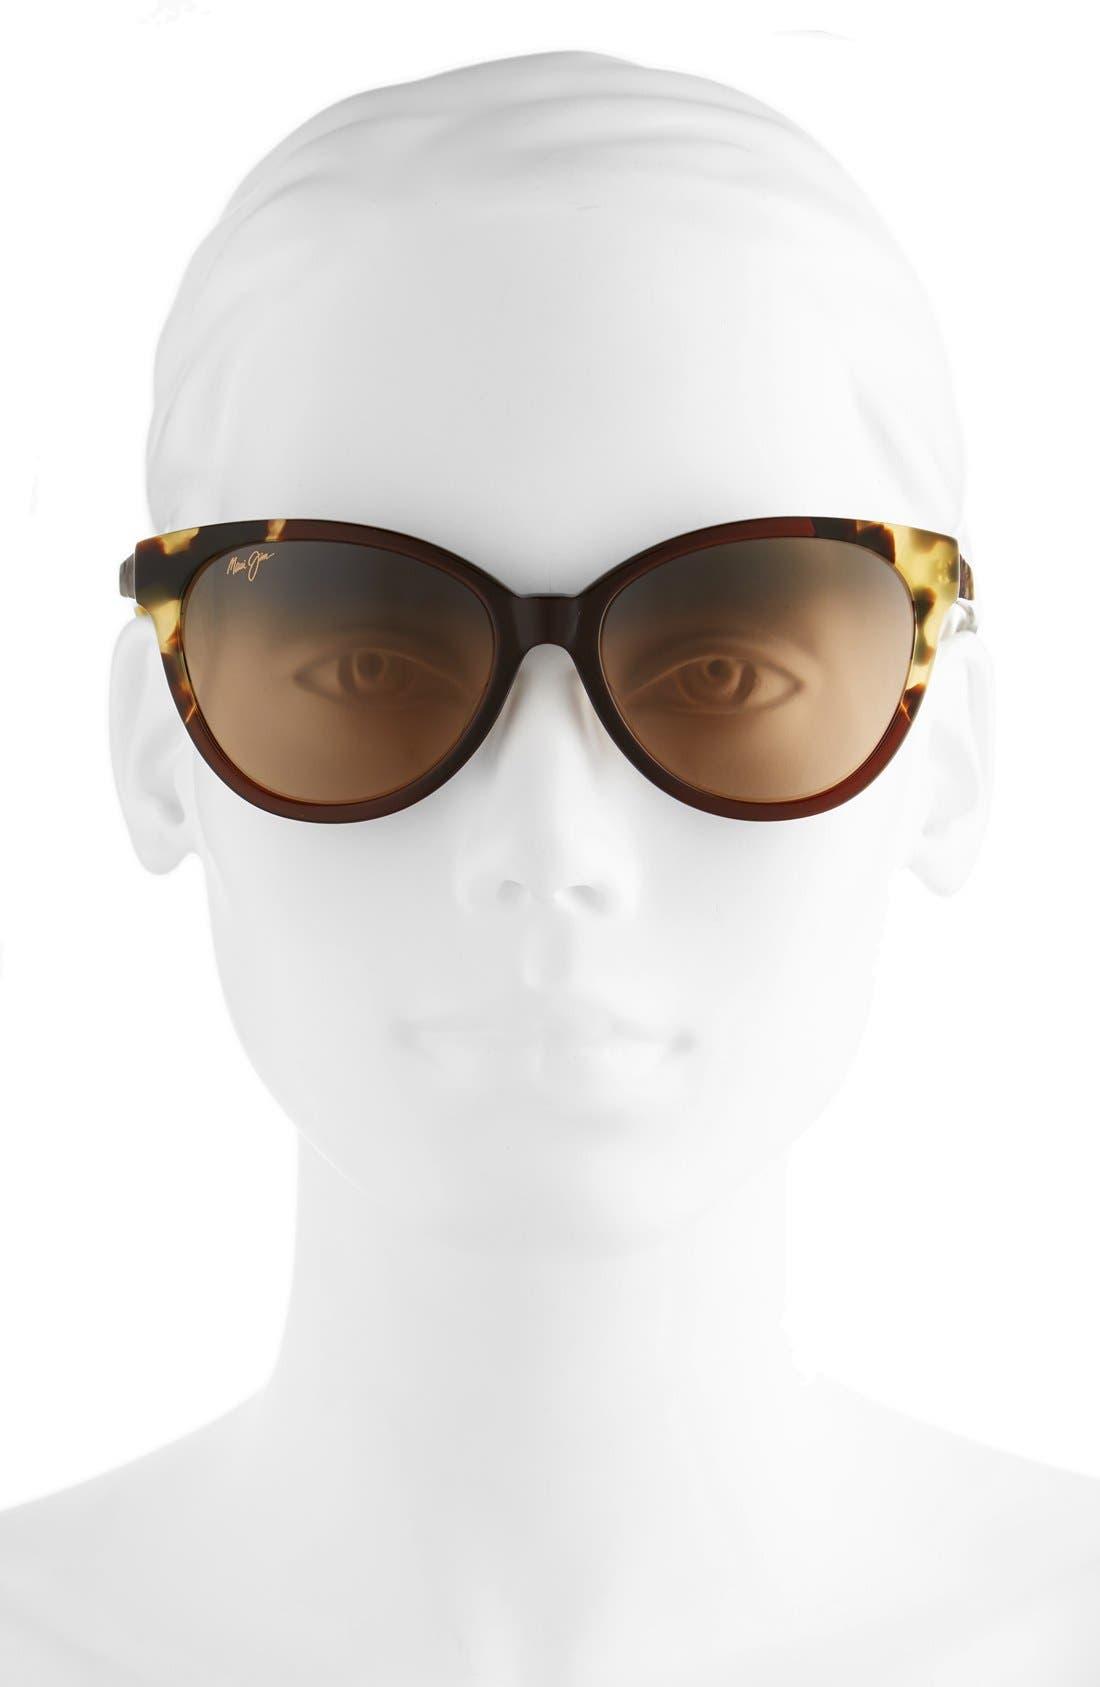 Sunshine 56mm PolarizedPlus2<sup>®</sup> Sunglasses,                             Alternate thumbnail 2, color,                             MARSALA TOKYO TORTOISE/ BRONZE